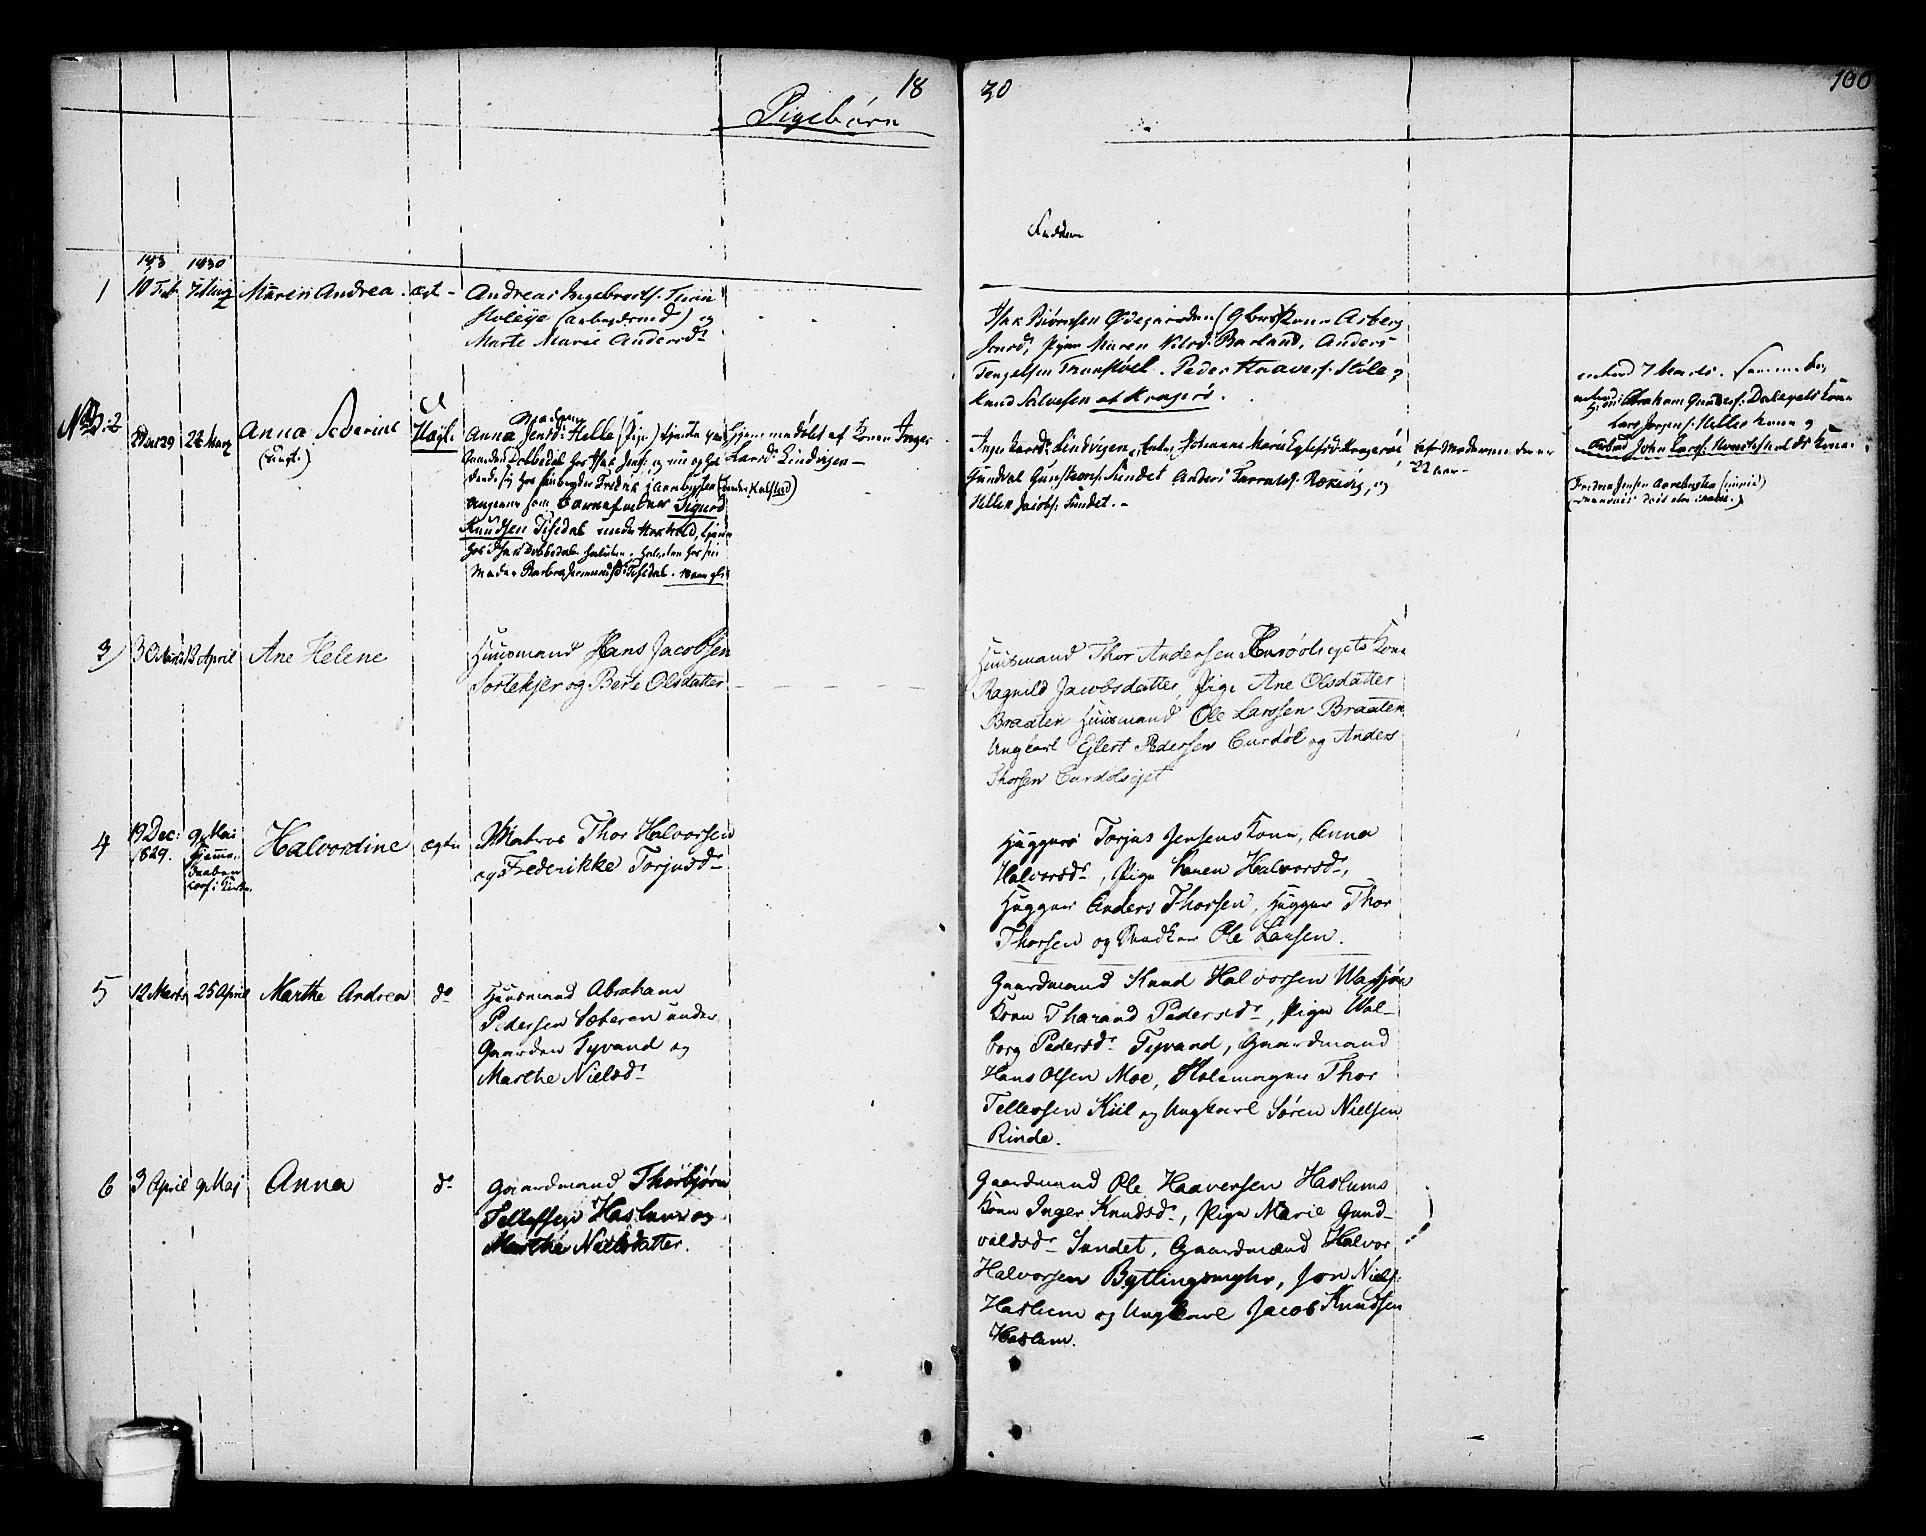 SAKO, Kragerø kirkebøker, F/Fa/L0002: Ministerialbok nr. 2, 1767-1802, s. 100